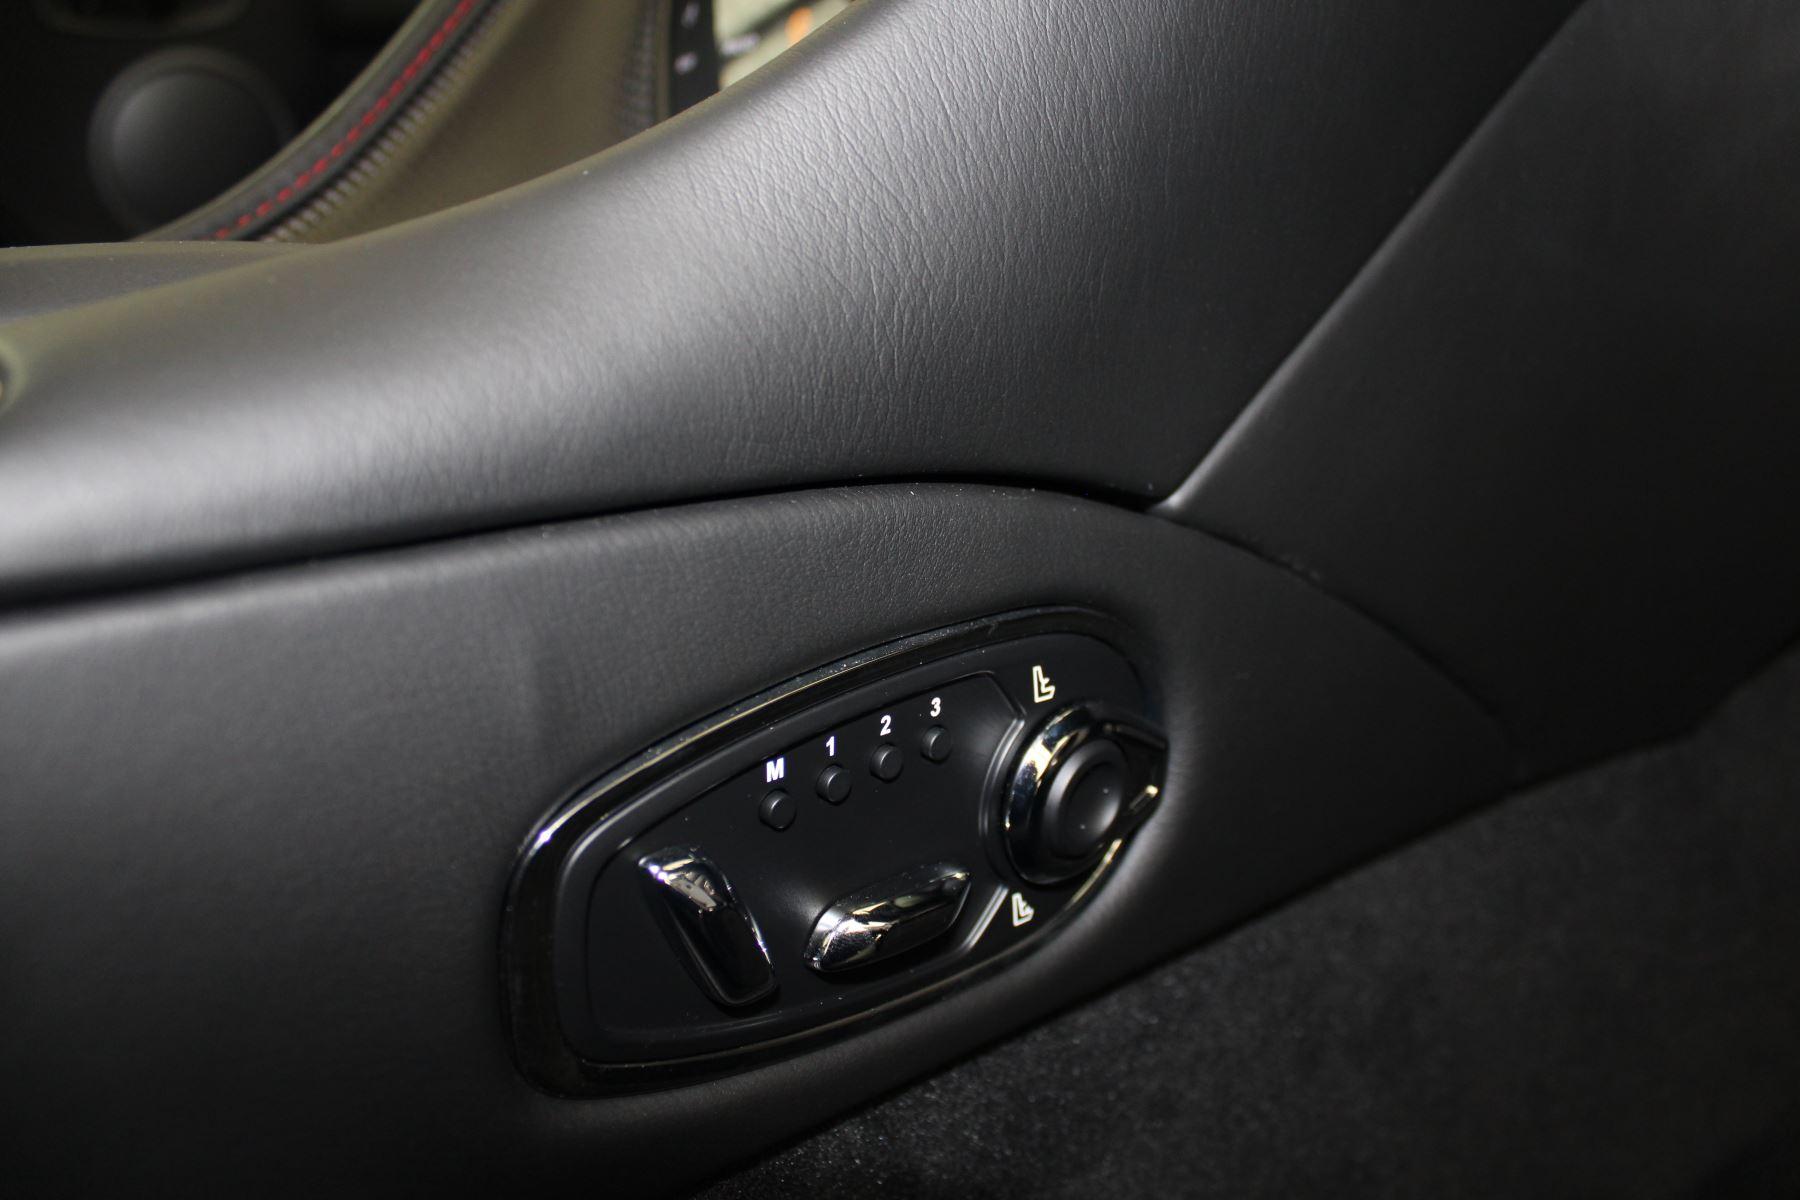 Aston Martin DB11 V8 2dr Touchtronic image 11